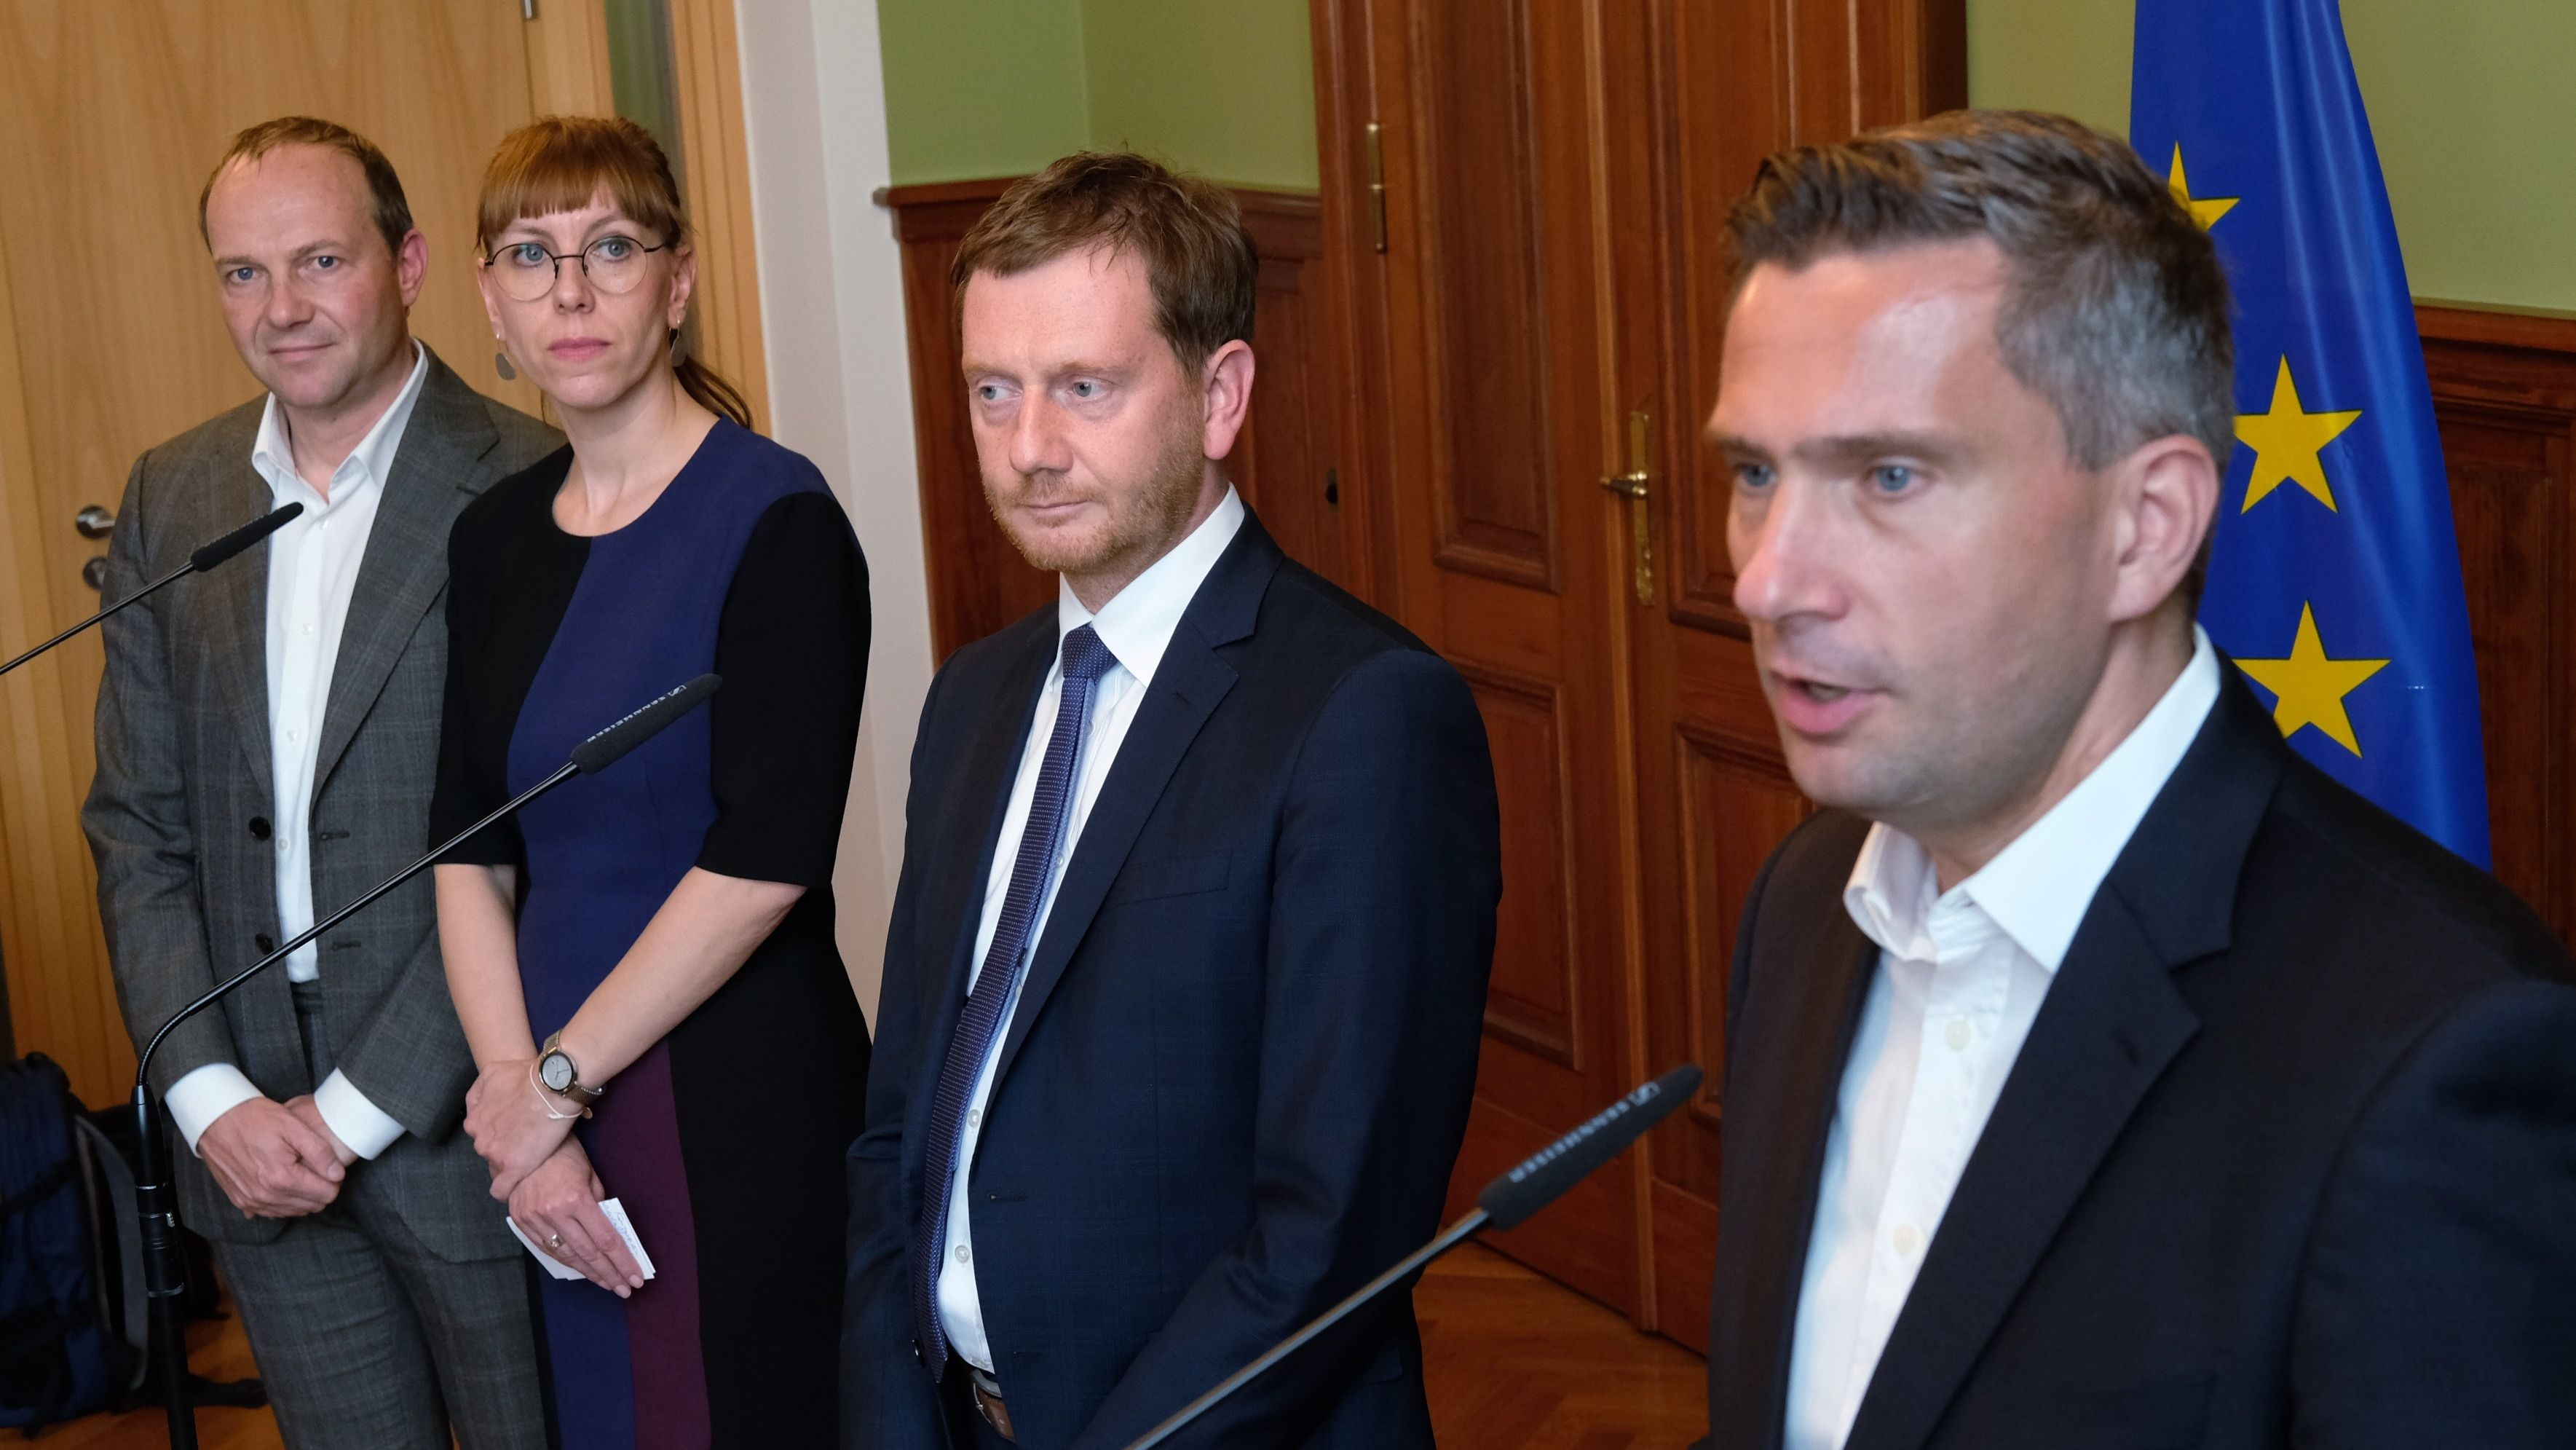 Kenia-Bündnis in Sachsen präsentiert Koalitionsvertrag